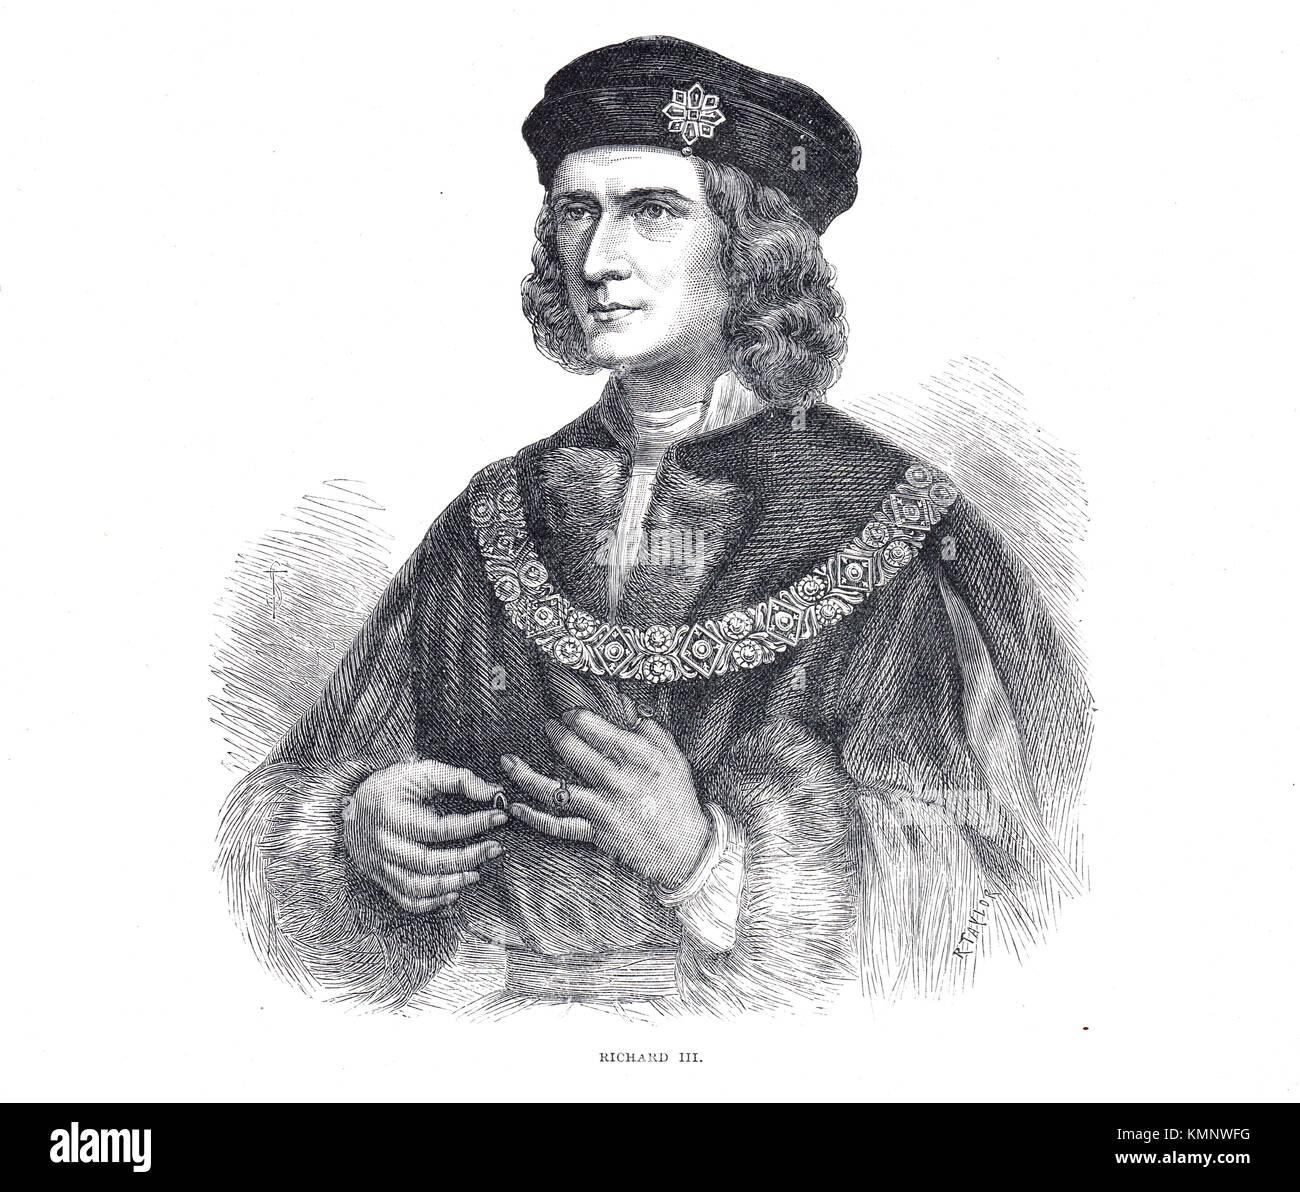 König Richard III. von England, 1452-1485, regierte 1483-1485 Stockbild